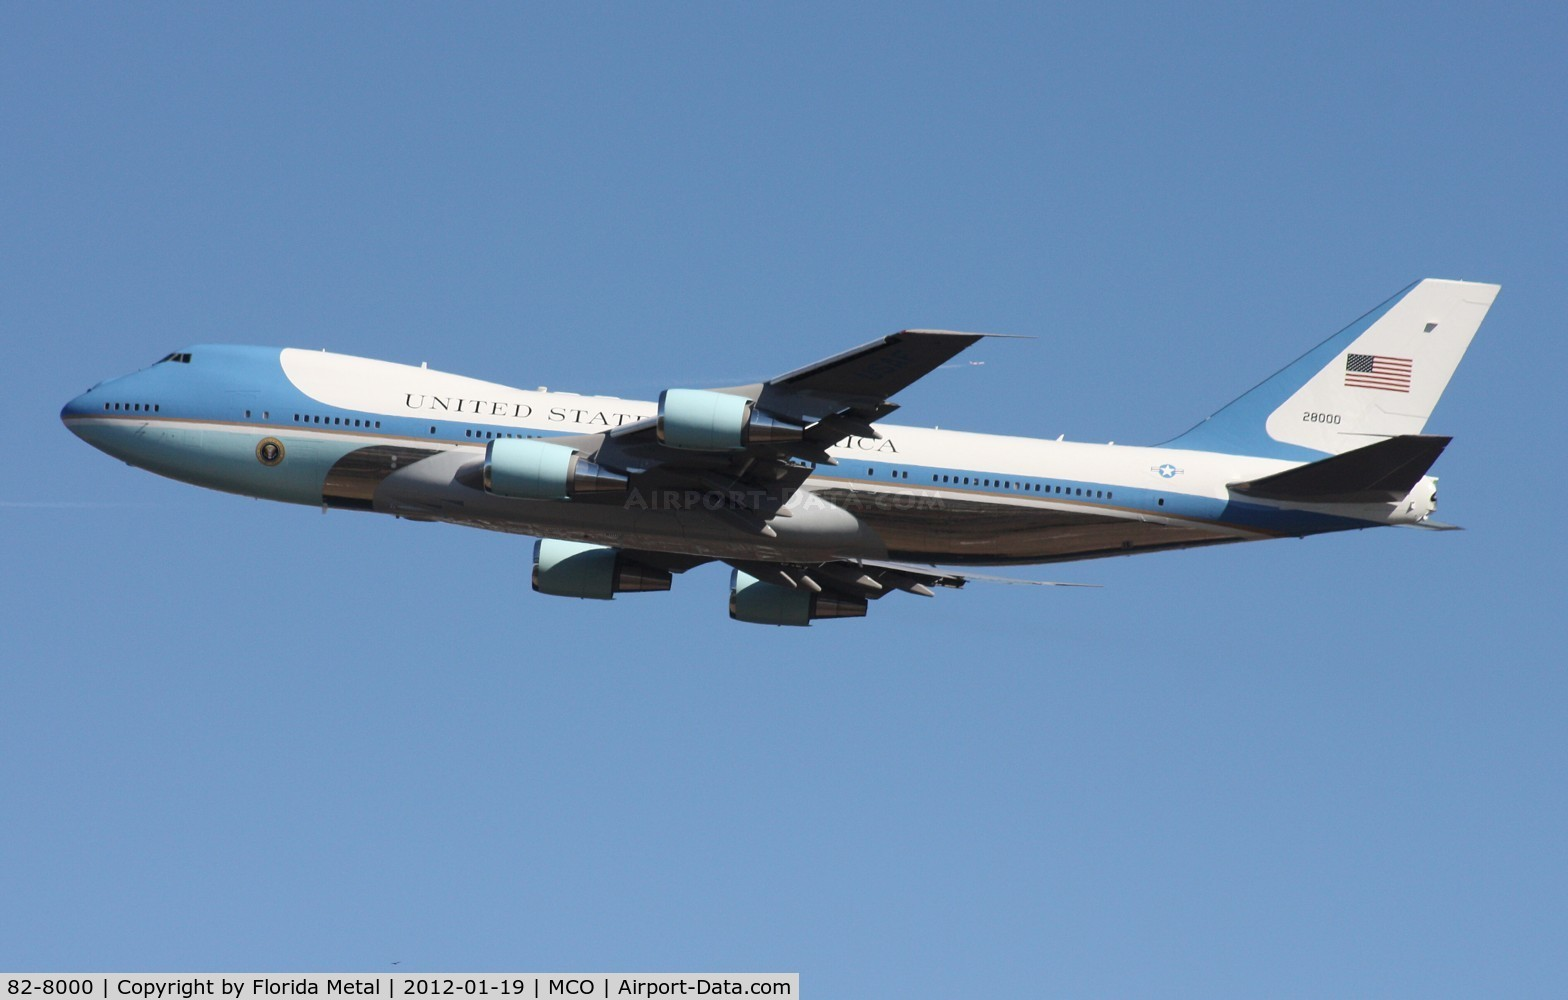 82-8000, 1988 Boeing VC-25A C/N 23824, Air Force One